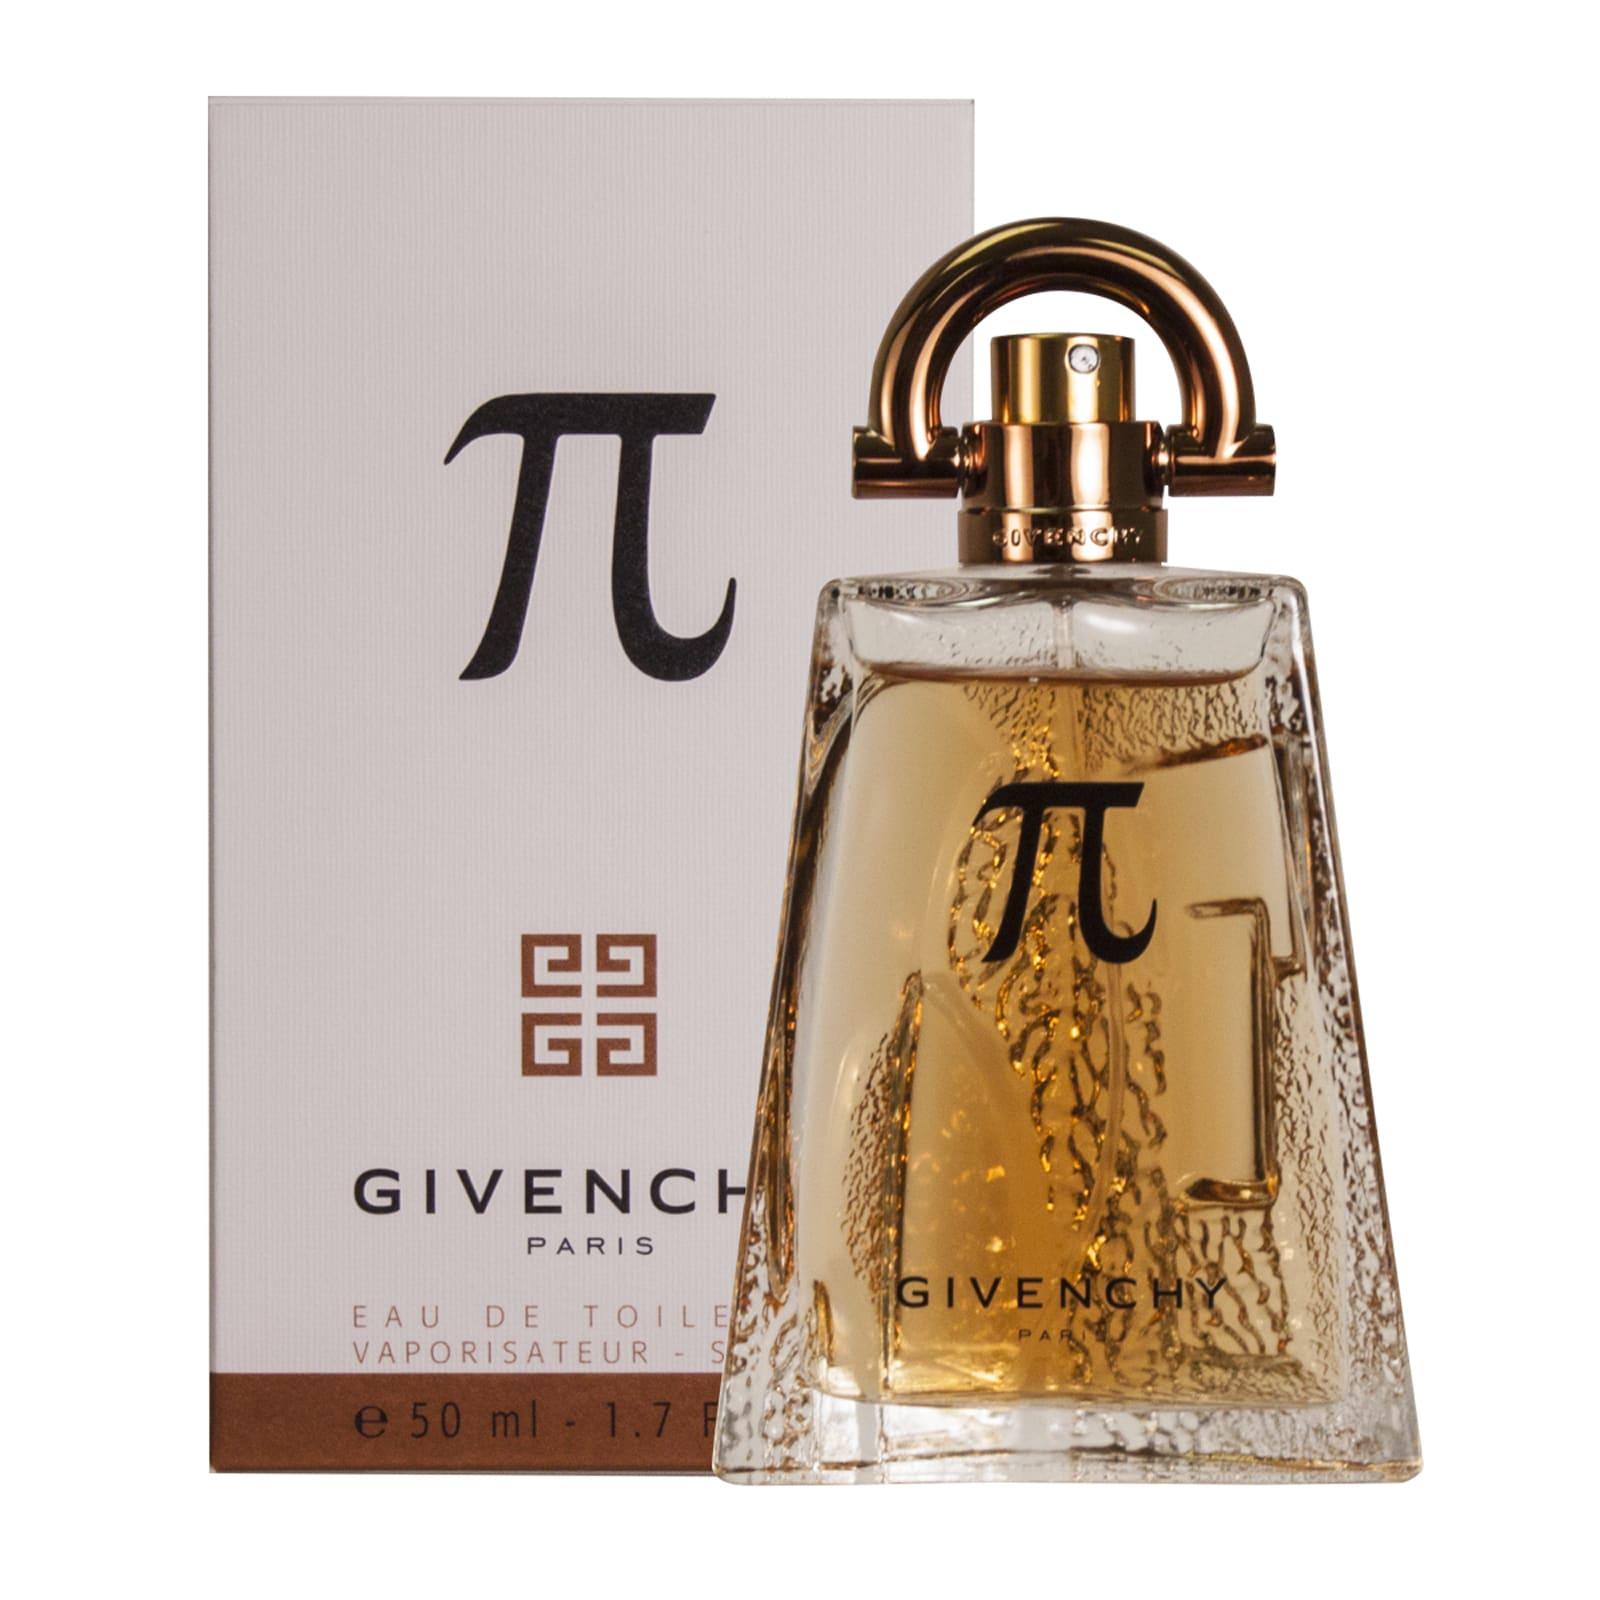 Givenchy 'PI' Men's 1.7-ounce Eau de Toilette Spray at Sears.com